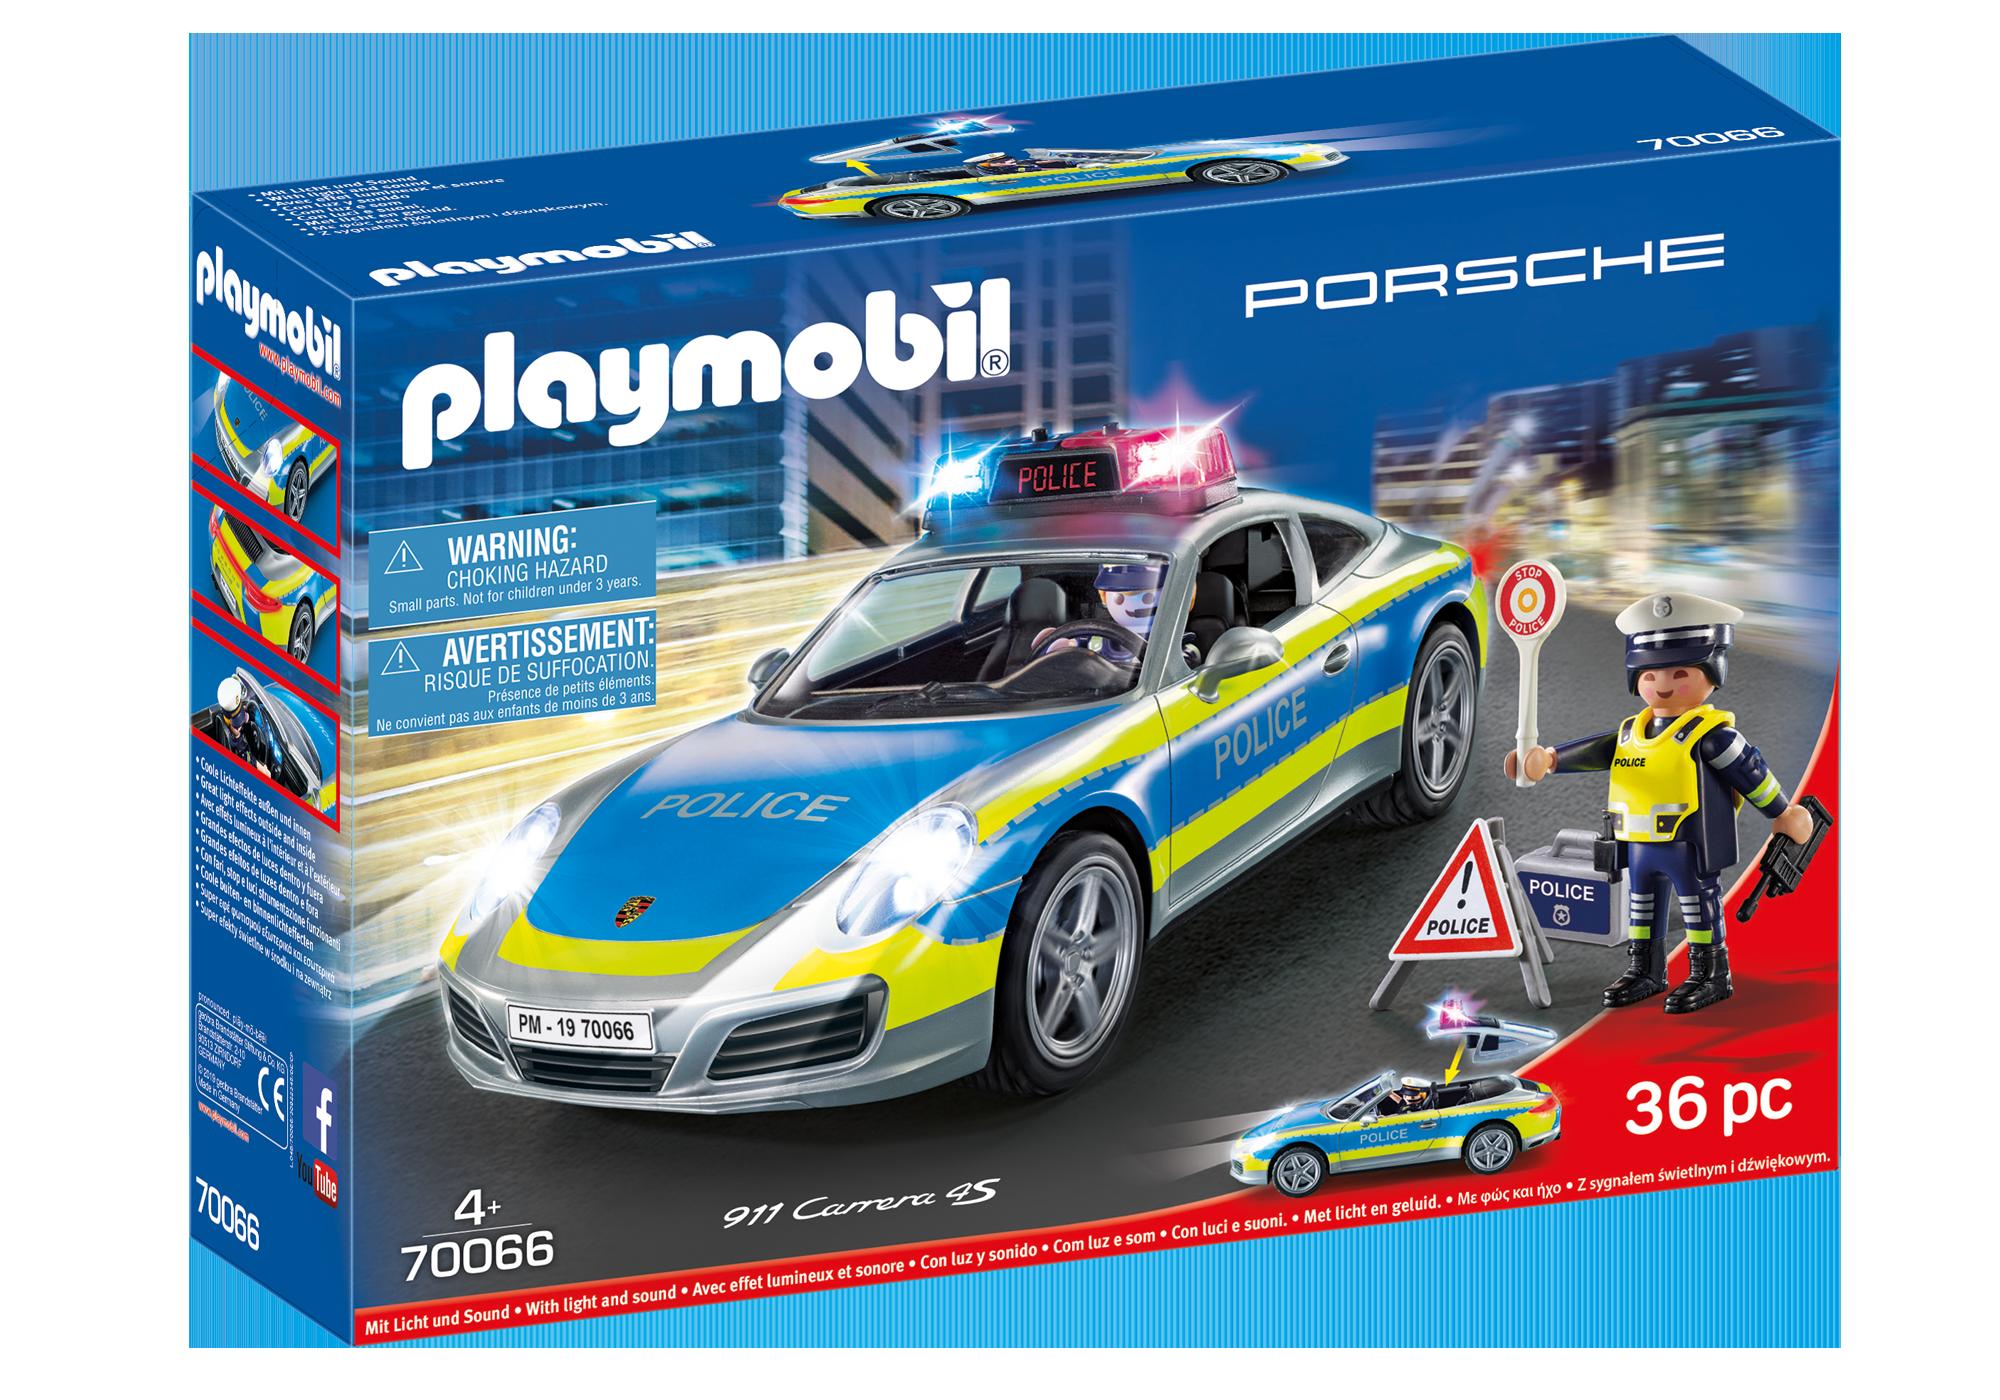 http://media.playmobil.com/i/playmobil/70066_product_box_front/Porsche 911 Carrera 4S Politie